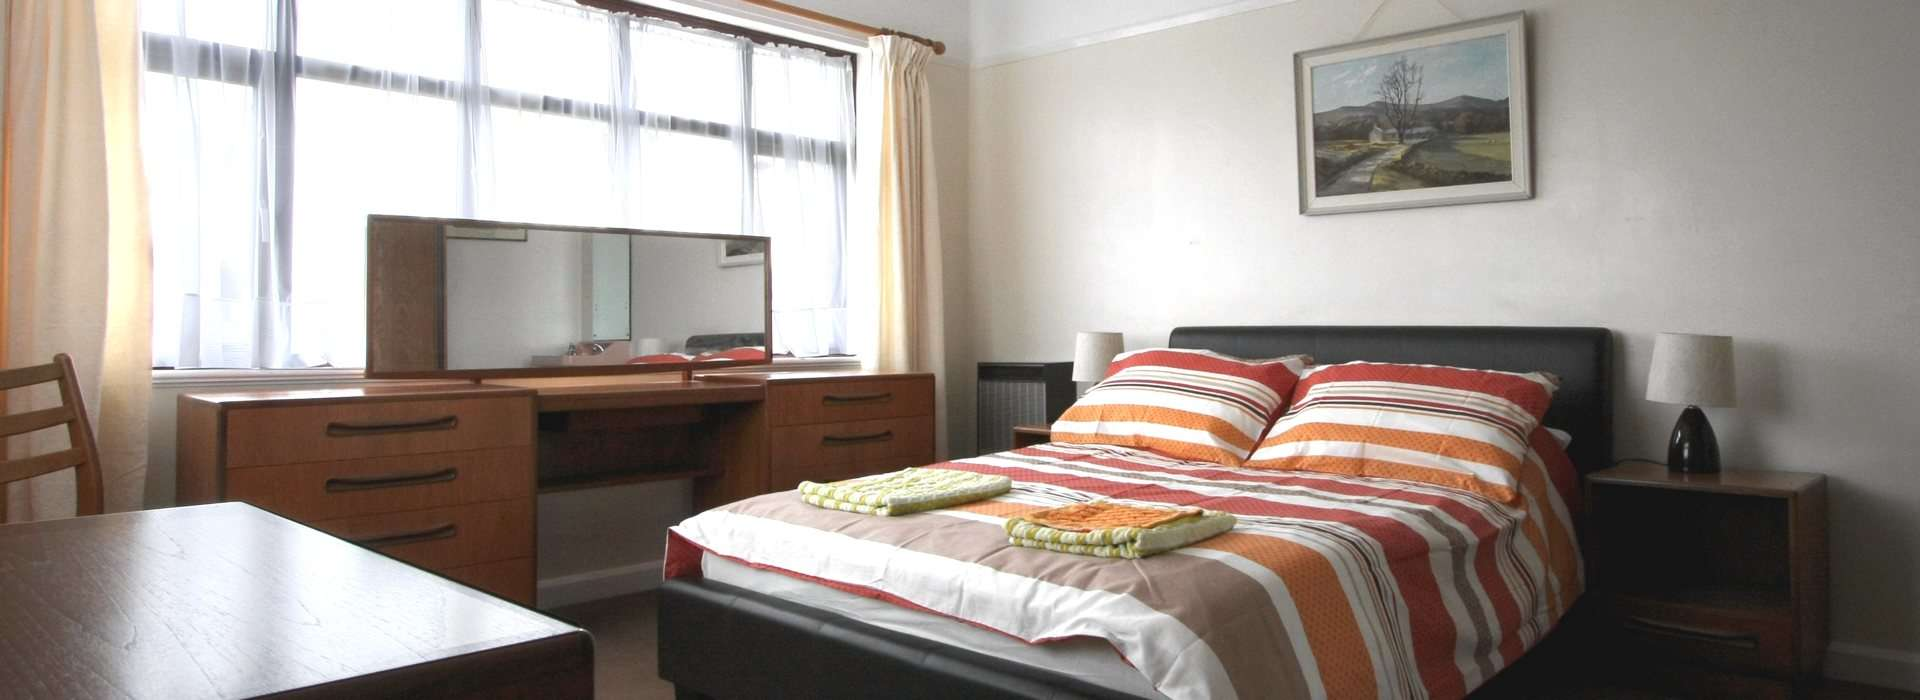 Comfortable holiday homes